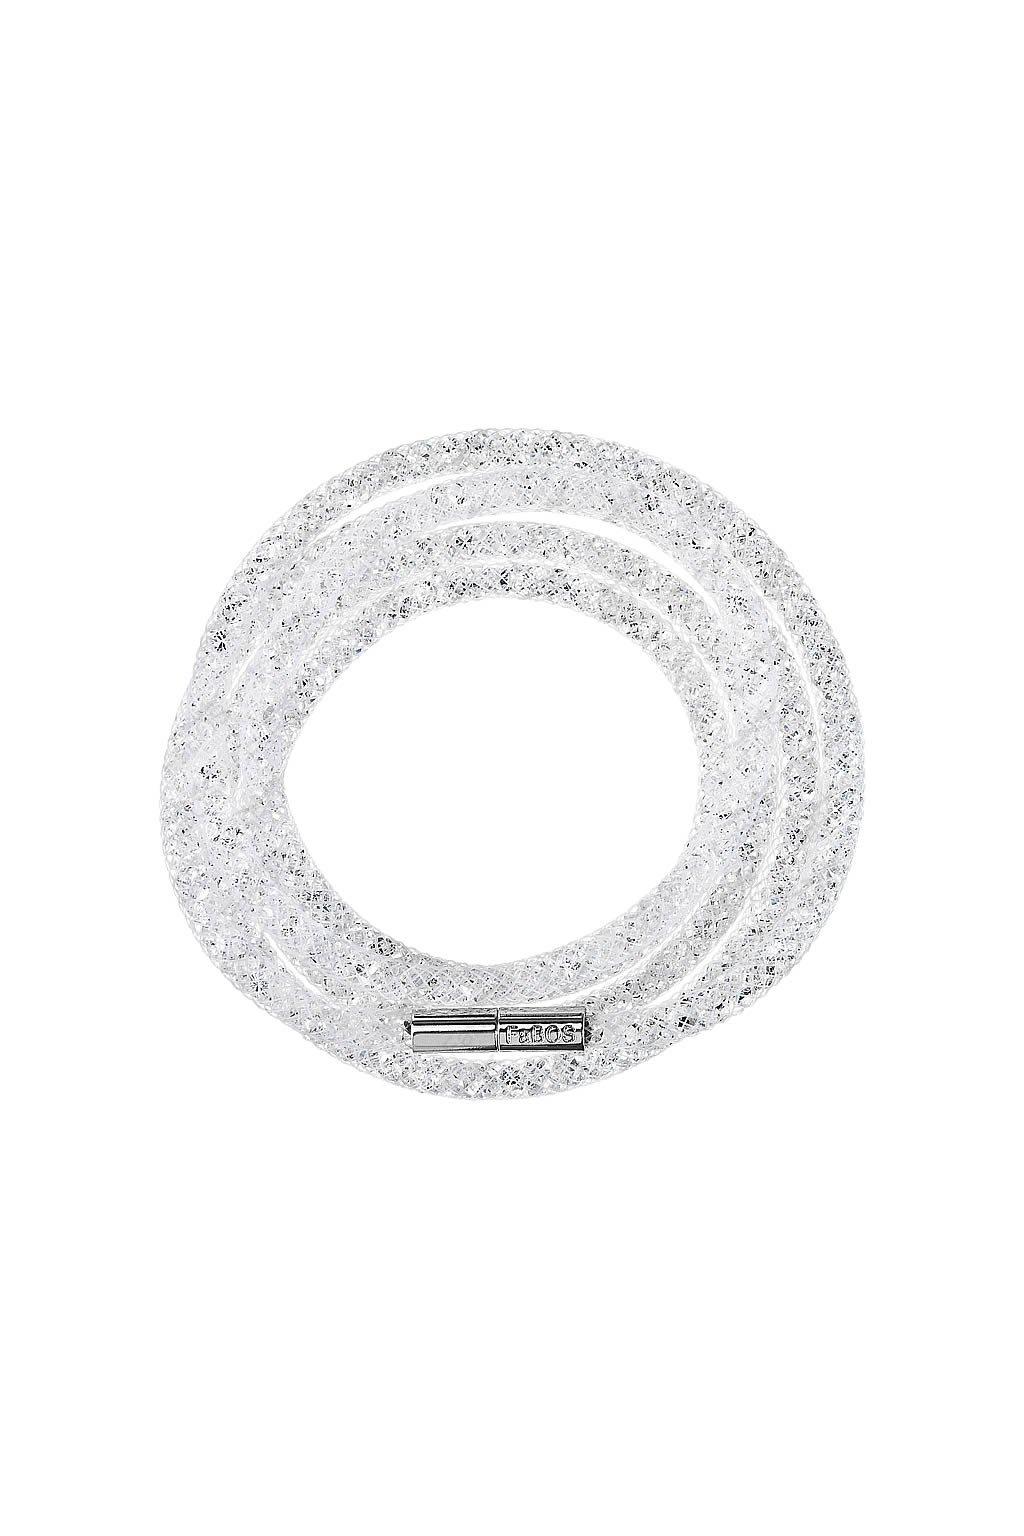 Náramek Crystal Tube 100 cm bílá